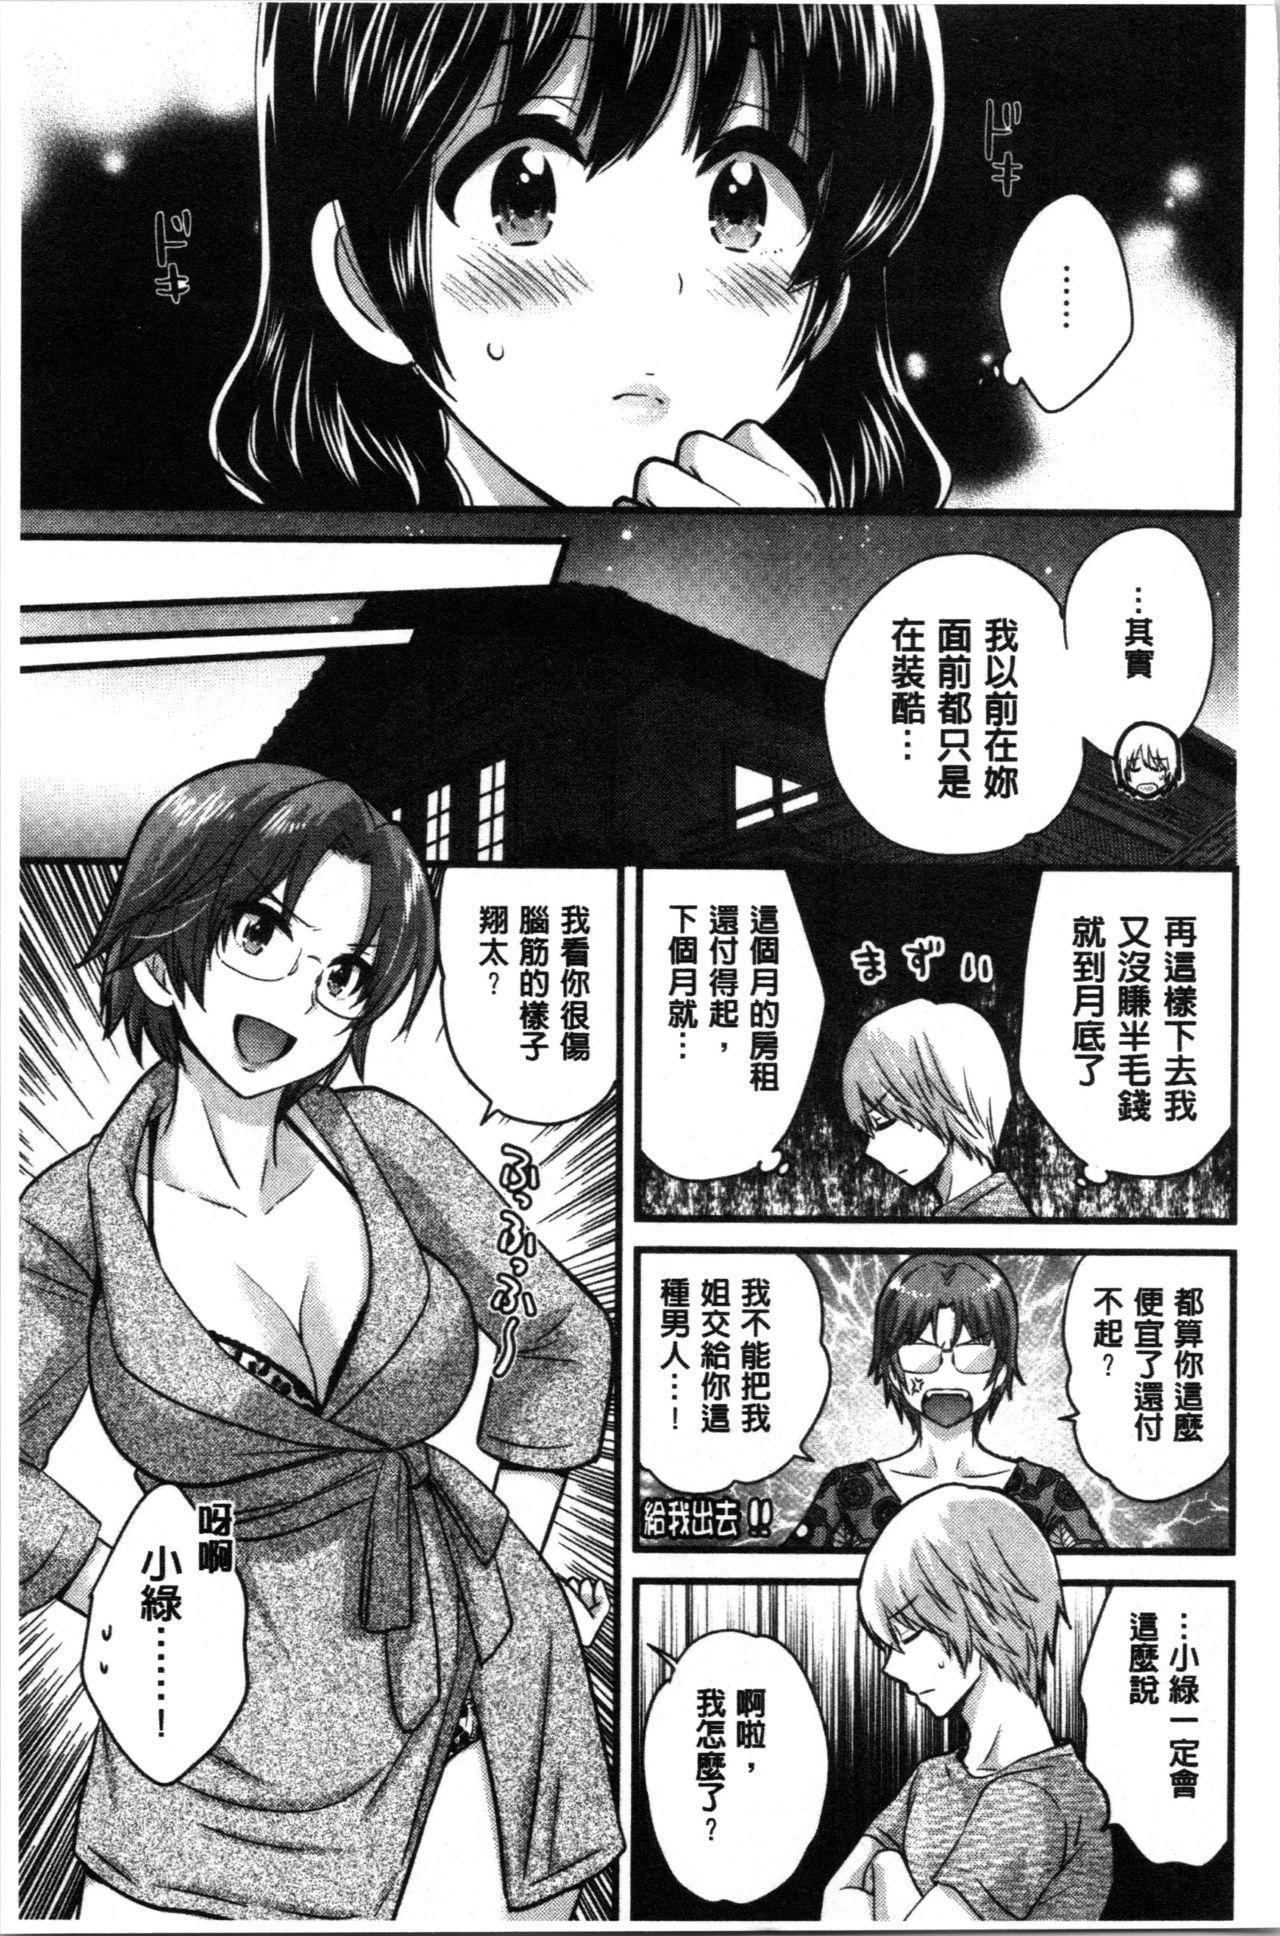 Ottori Midarana Mikami-san   嫻淑優雅又淫亂的三上小姐 82